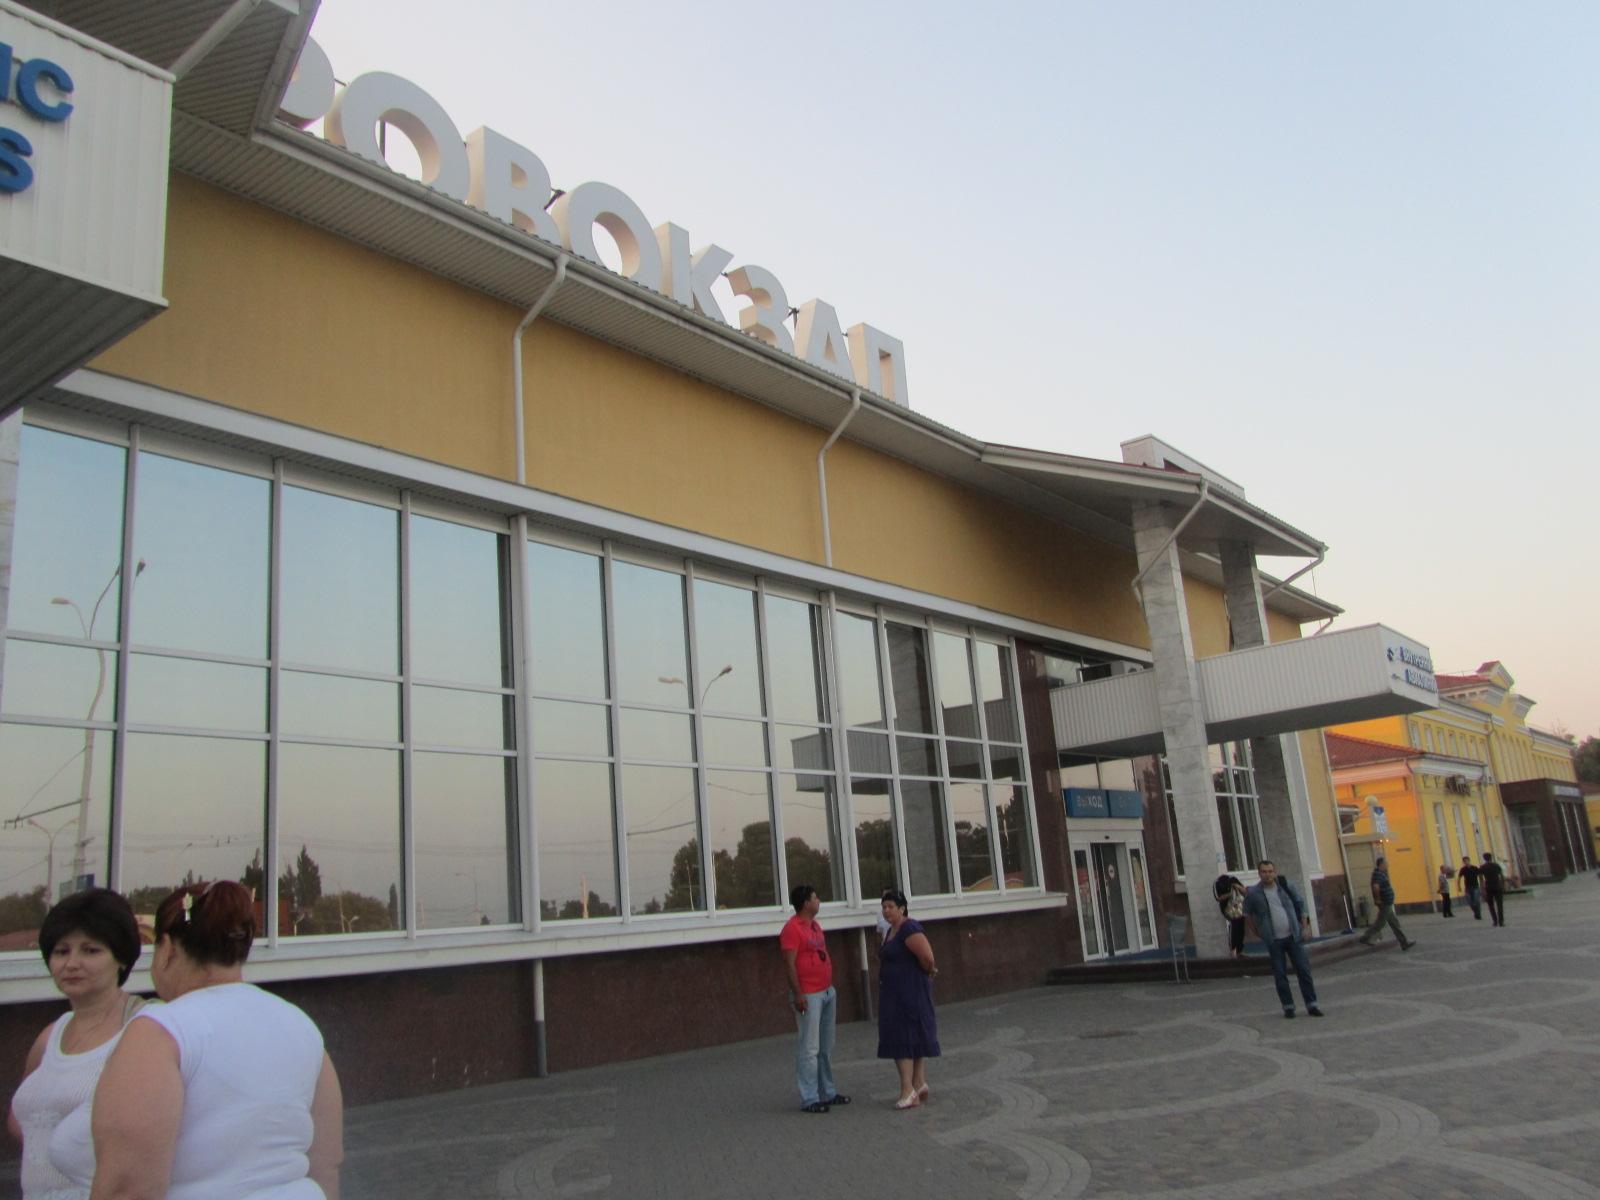 Аэропорт Краснодар Пашковская